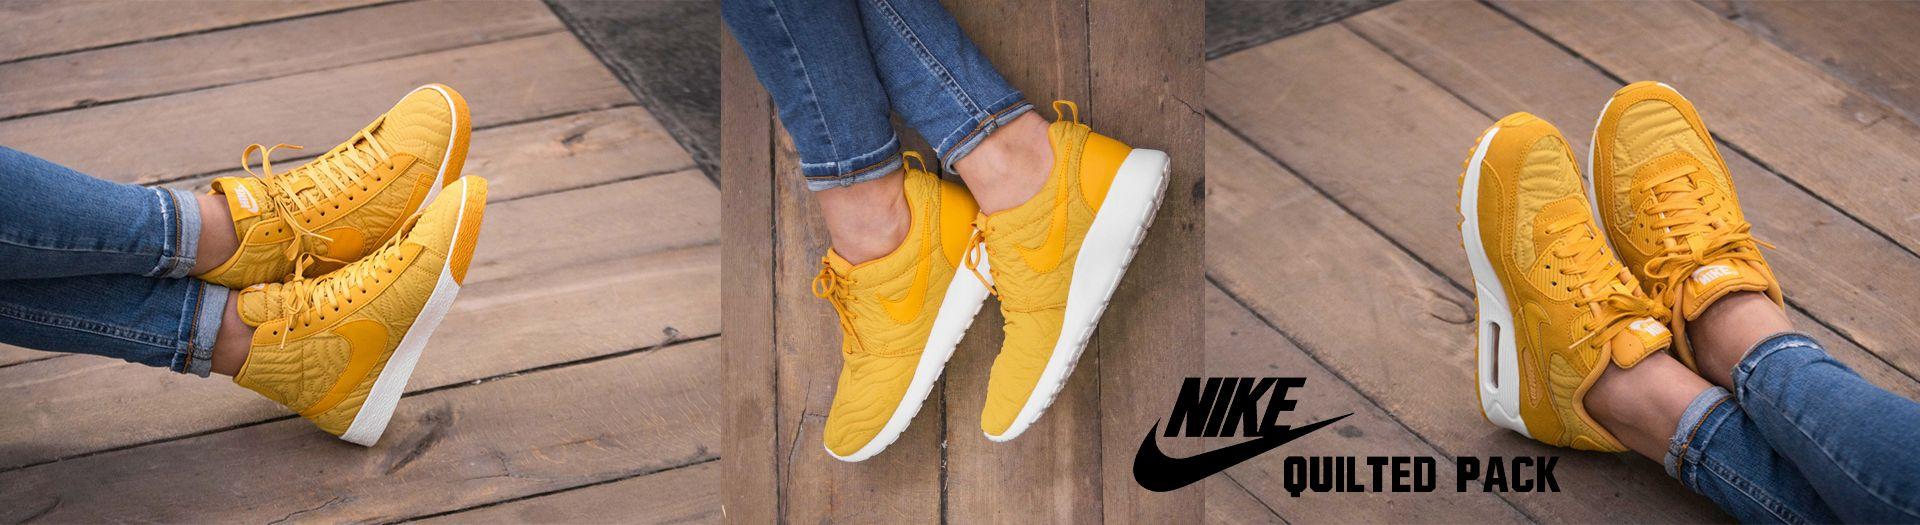 nike shoes, Sneakers fashion